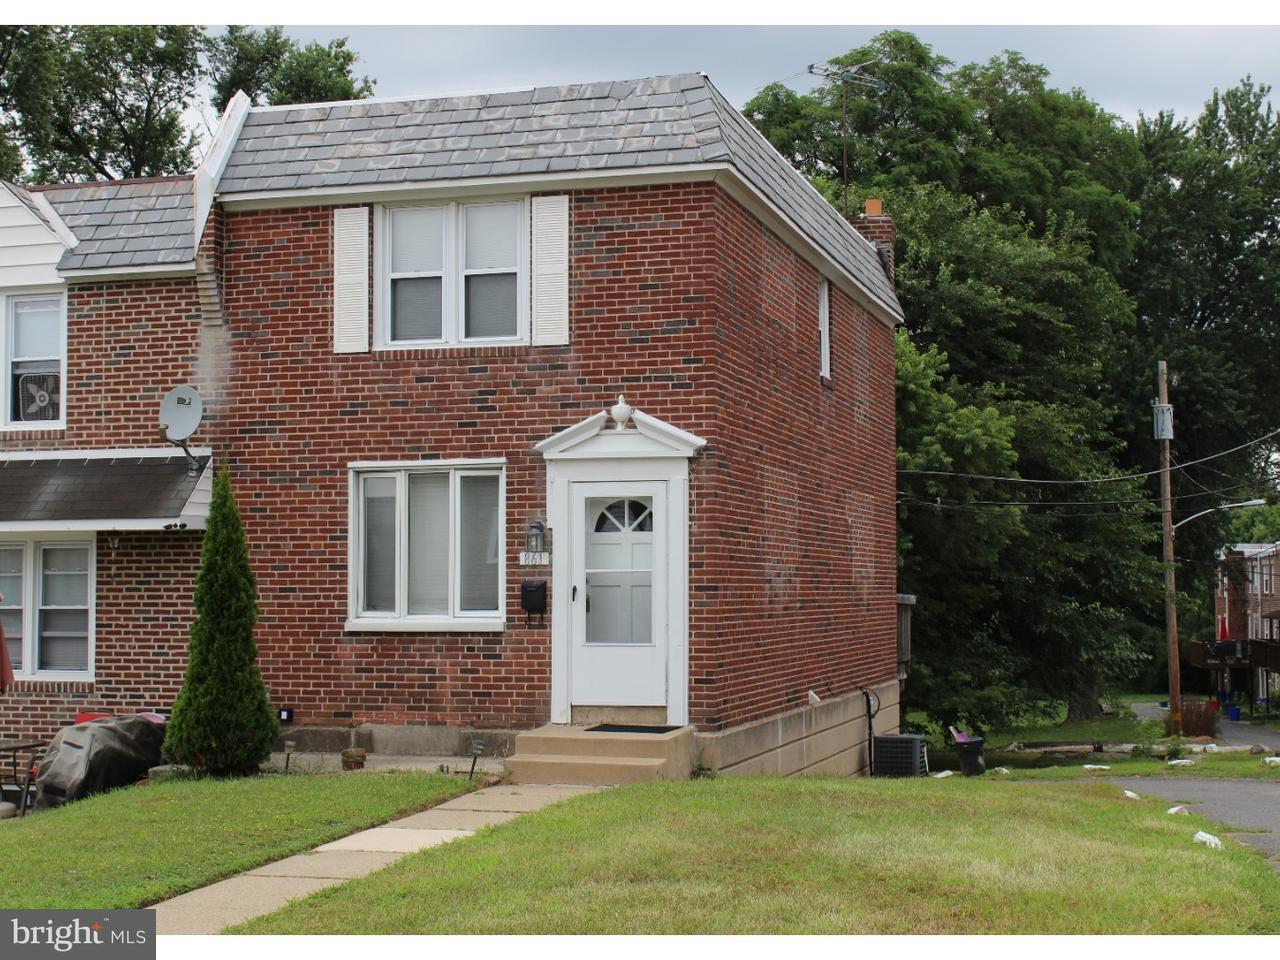 861  Fairfax Drexel Hill, PA 19026